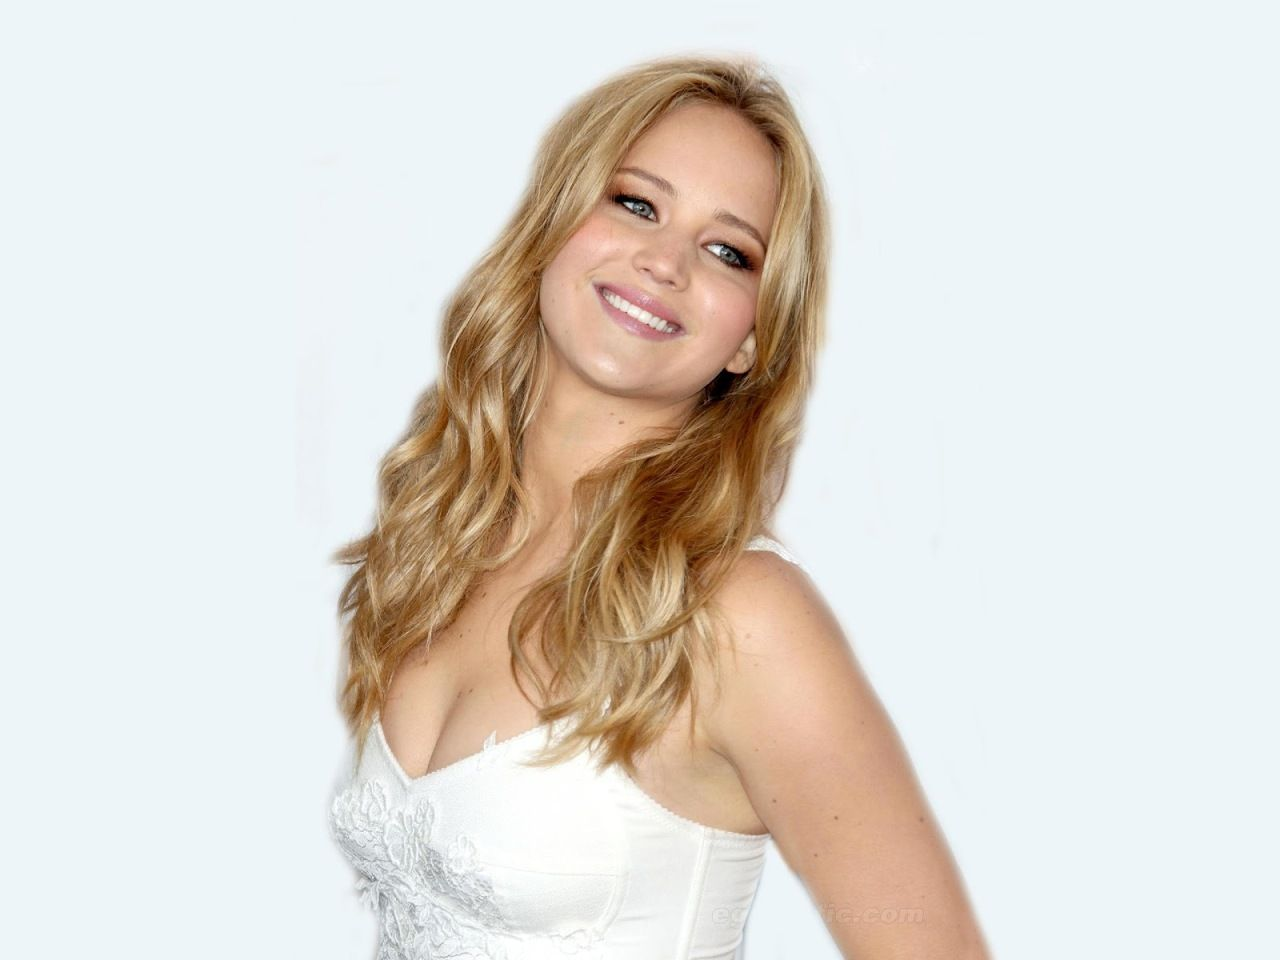 Jennifer Lawrence Hot wallpaper 14   Apnatimepasscom 1280x960